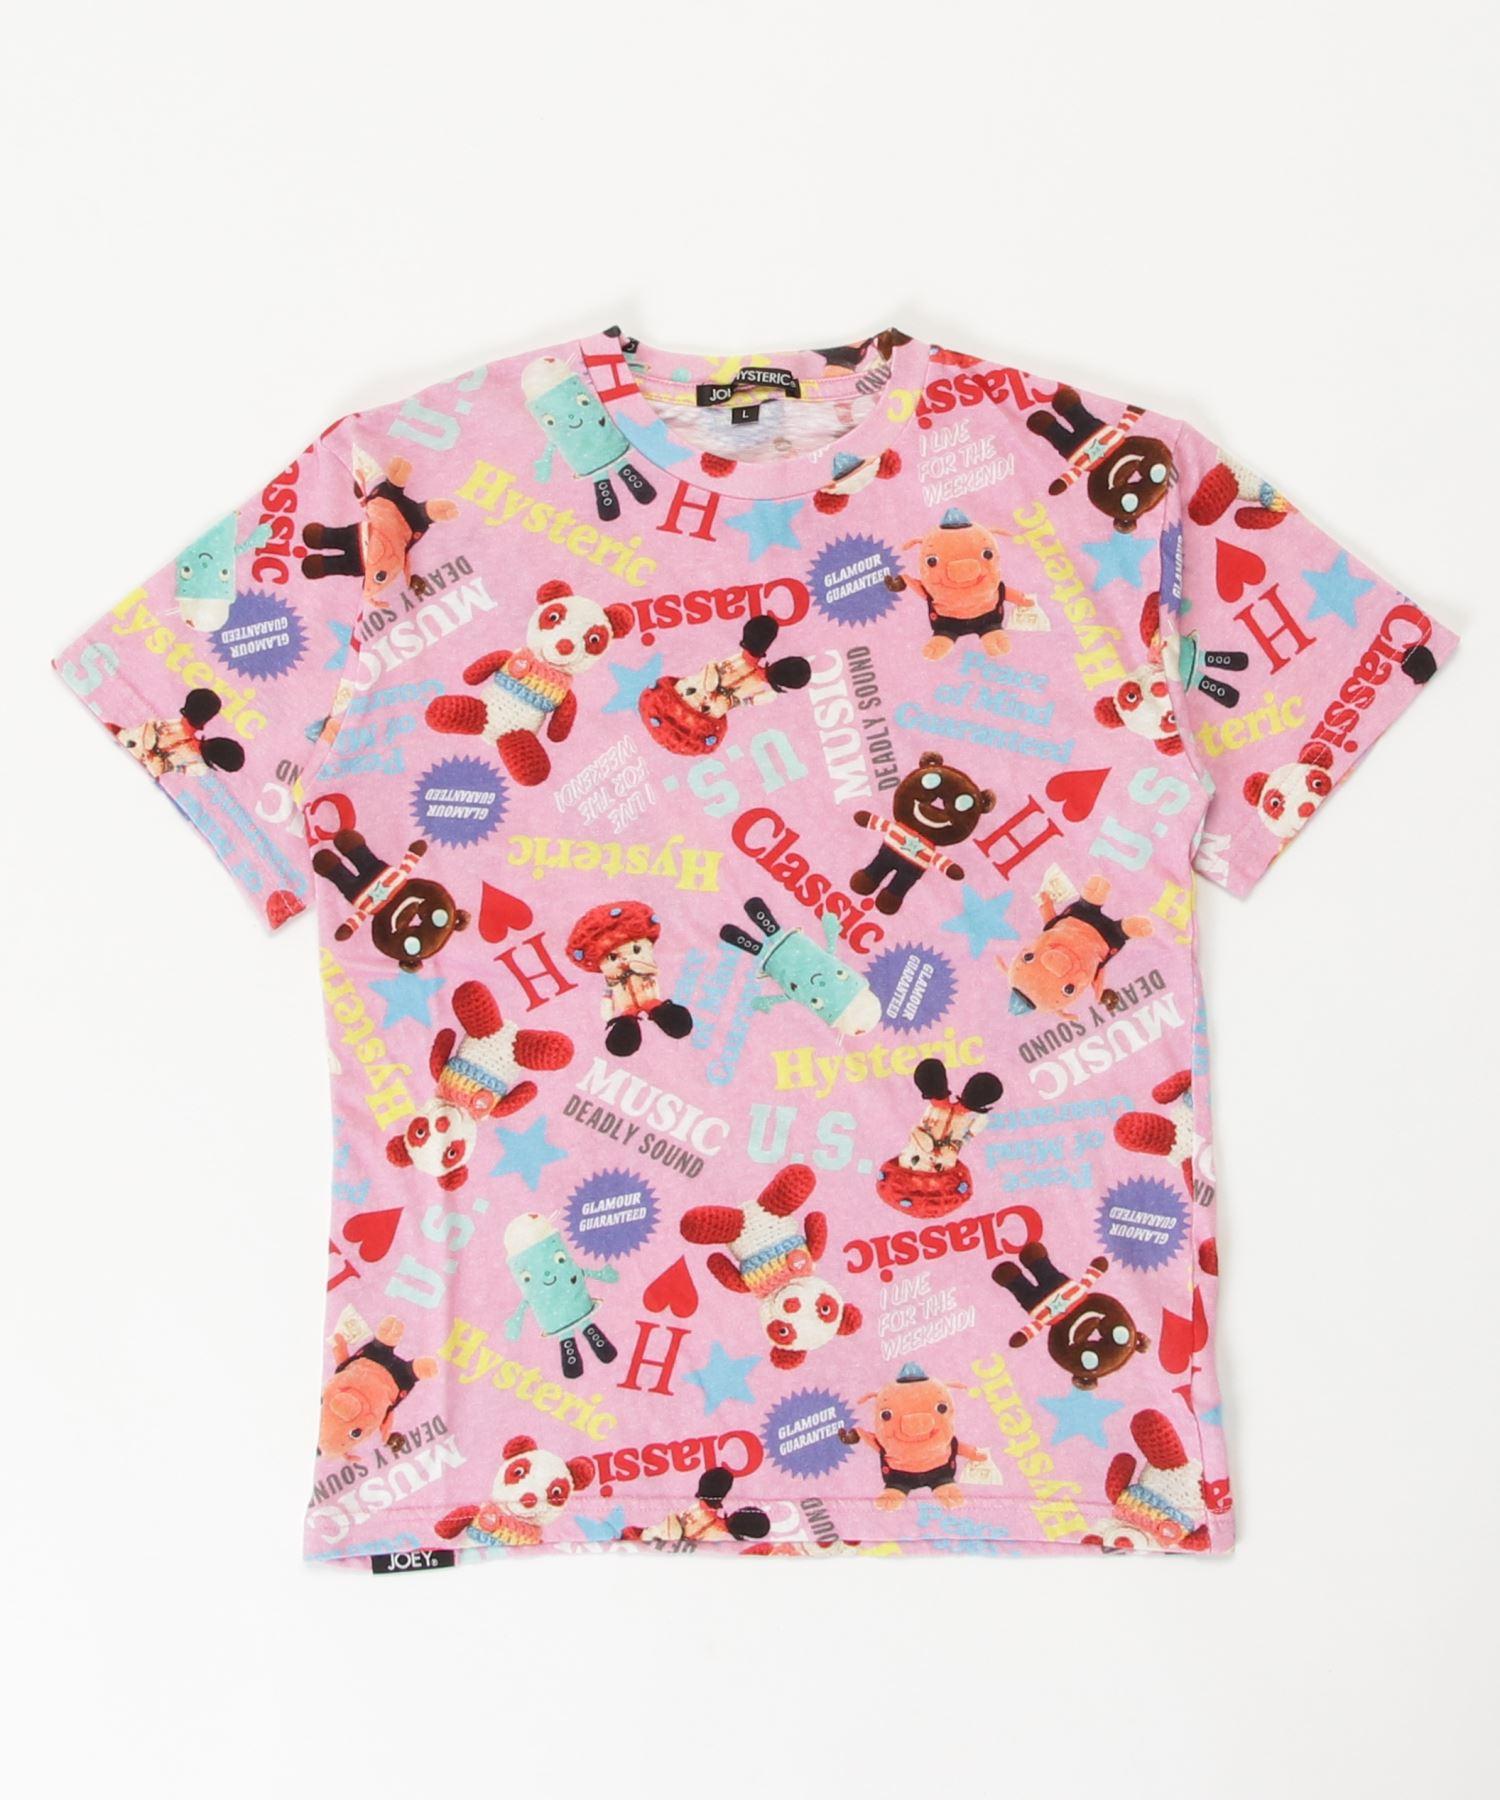 YOKO DOLL MIX柄 Tシャツ【L】